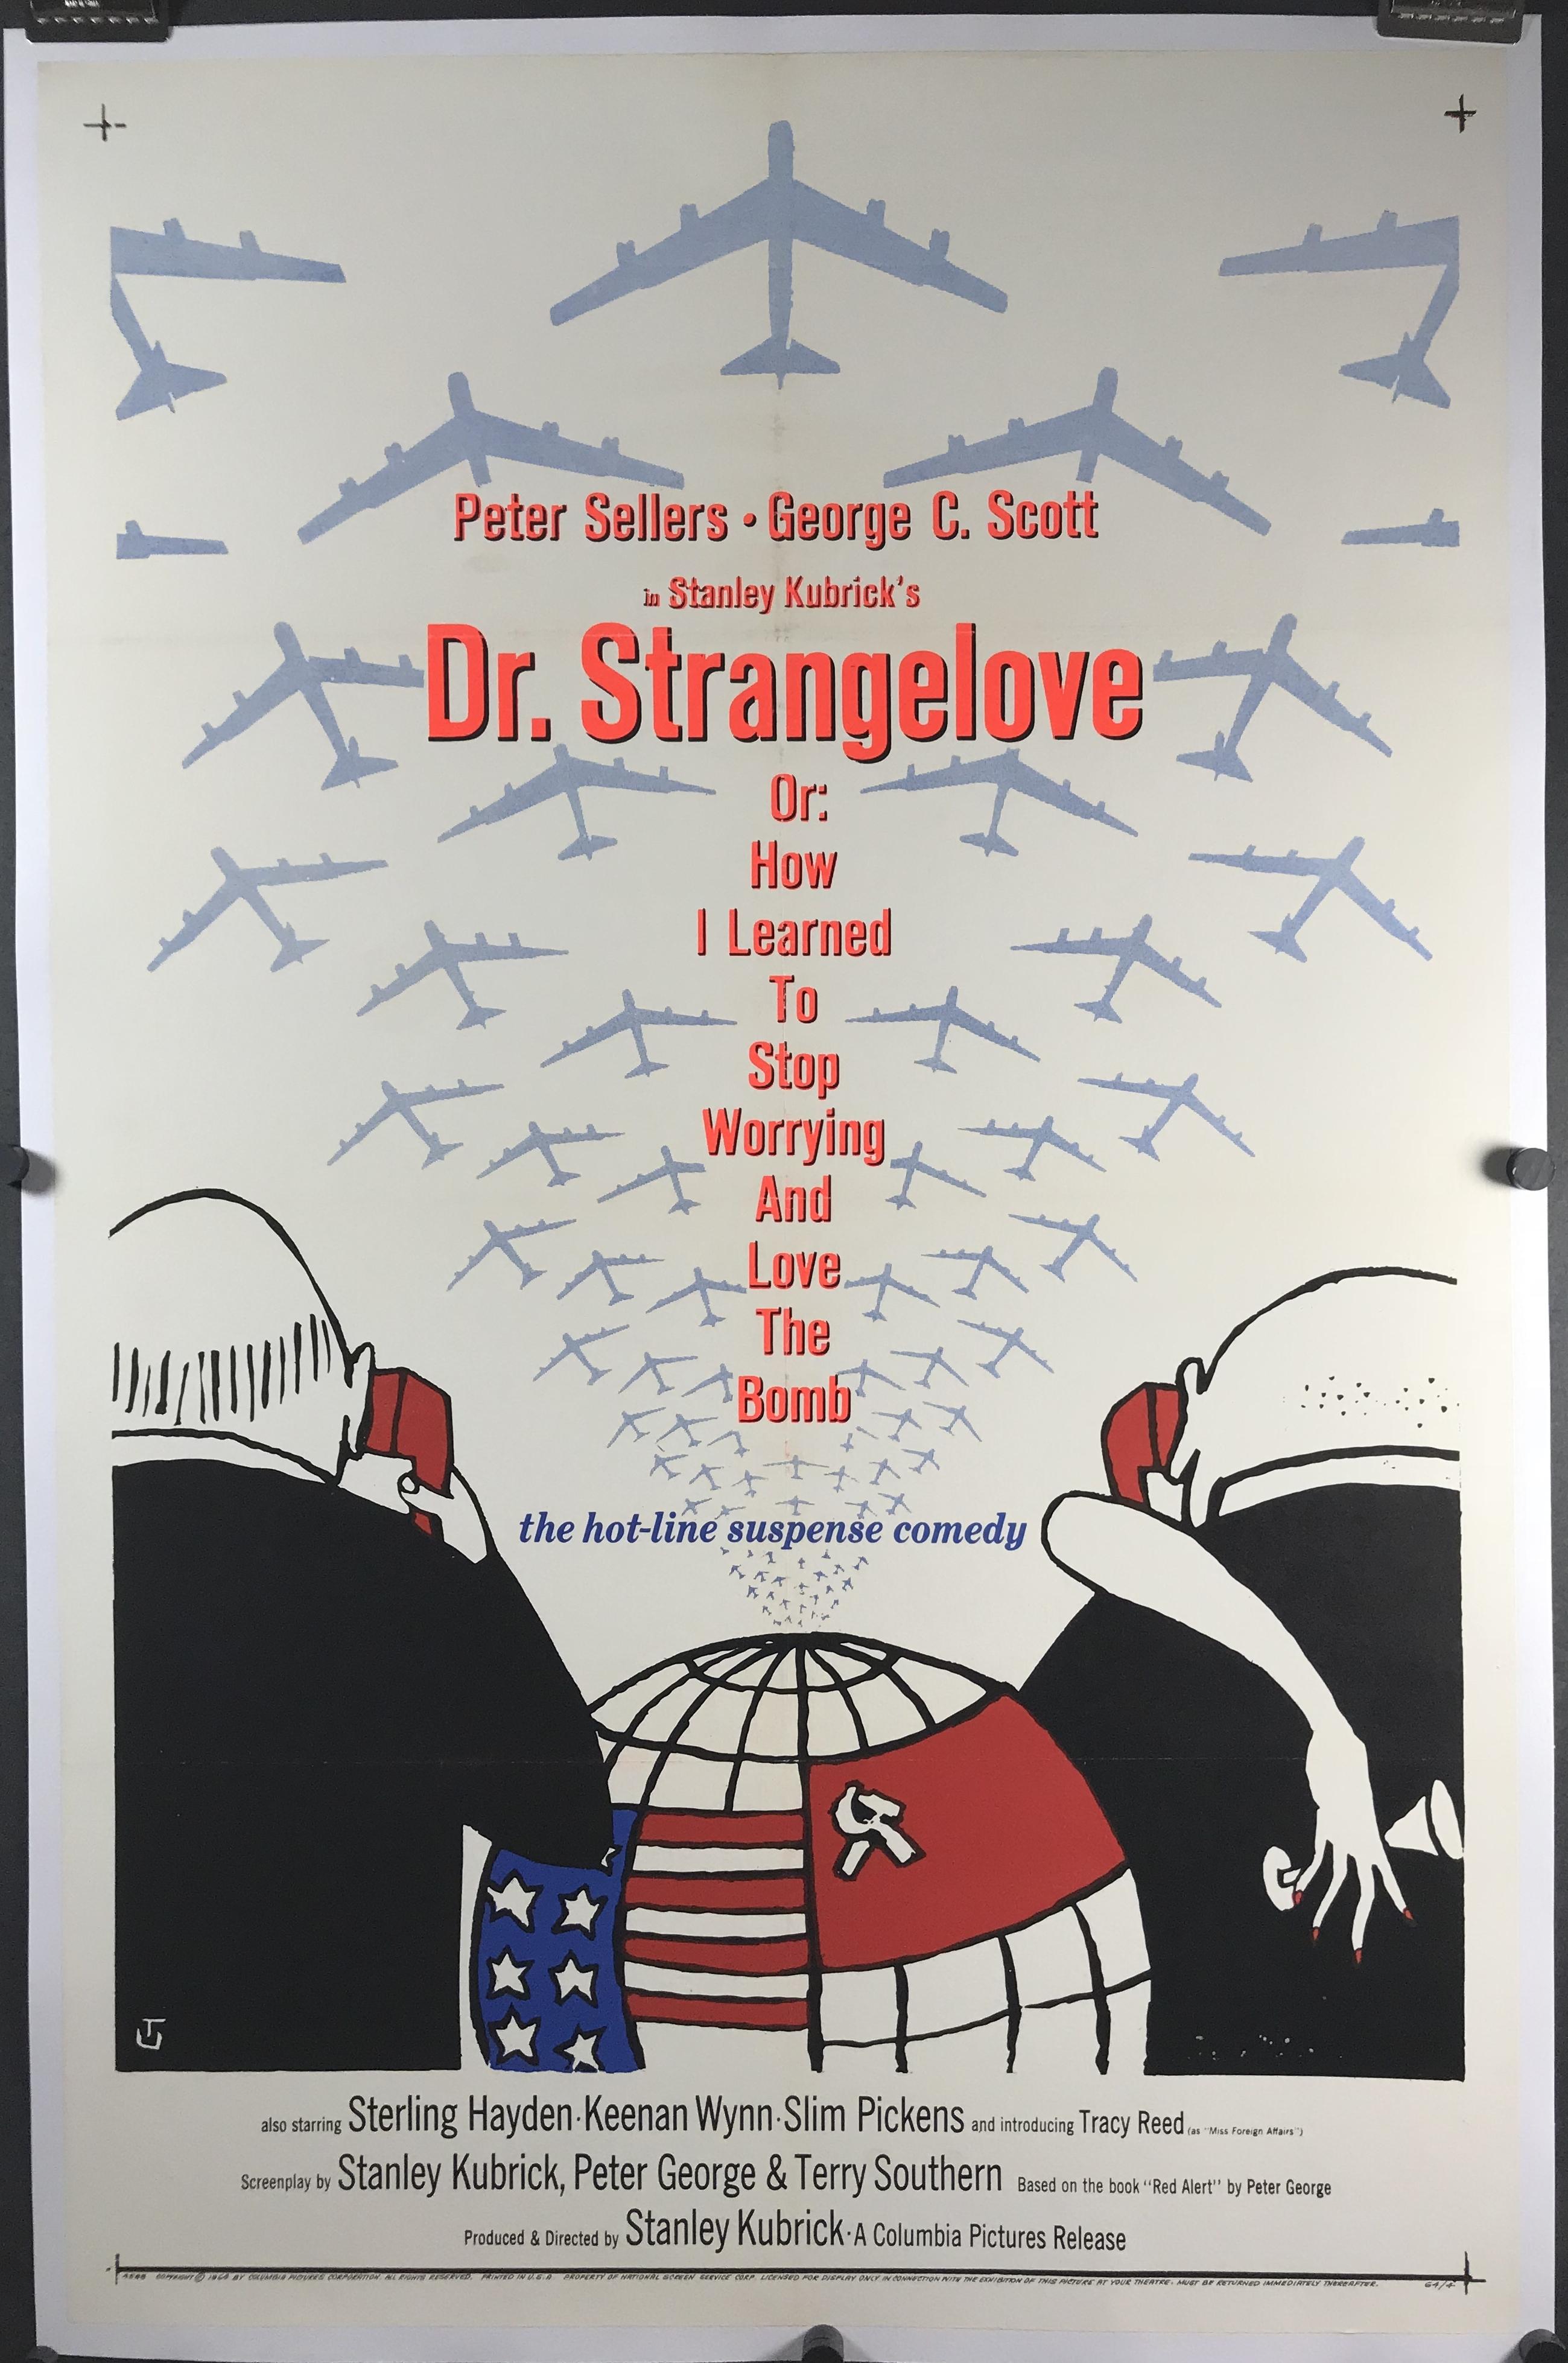 Vintage Dr Strangelove Movie Poster//// Classic Movie Poster////Movie Poster////Poste